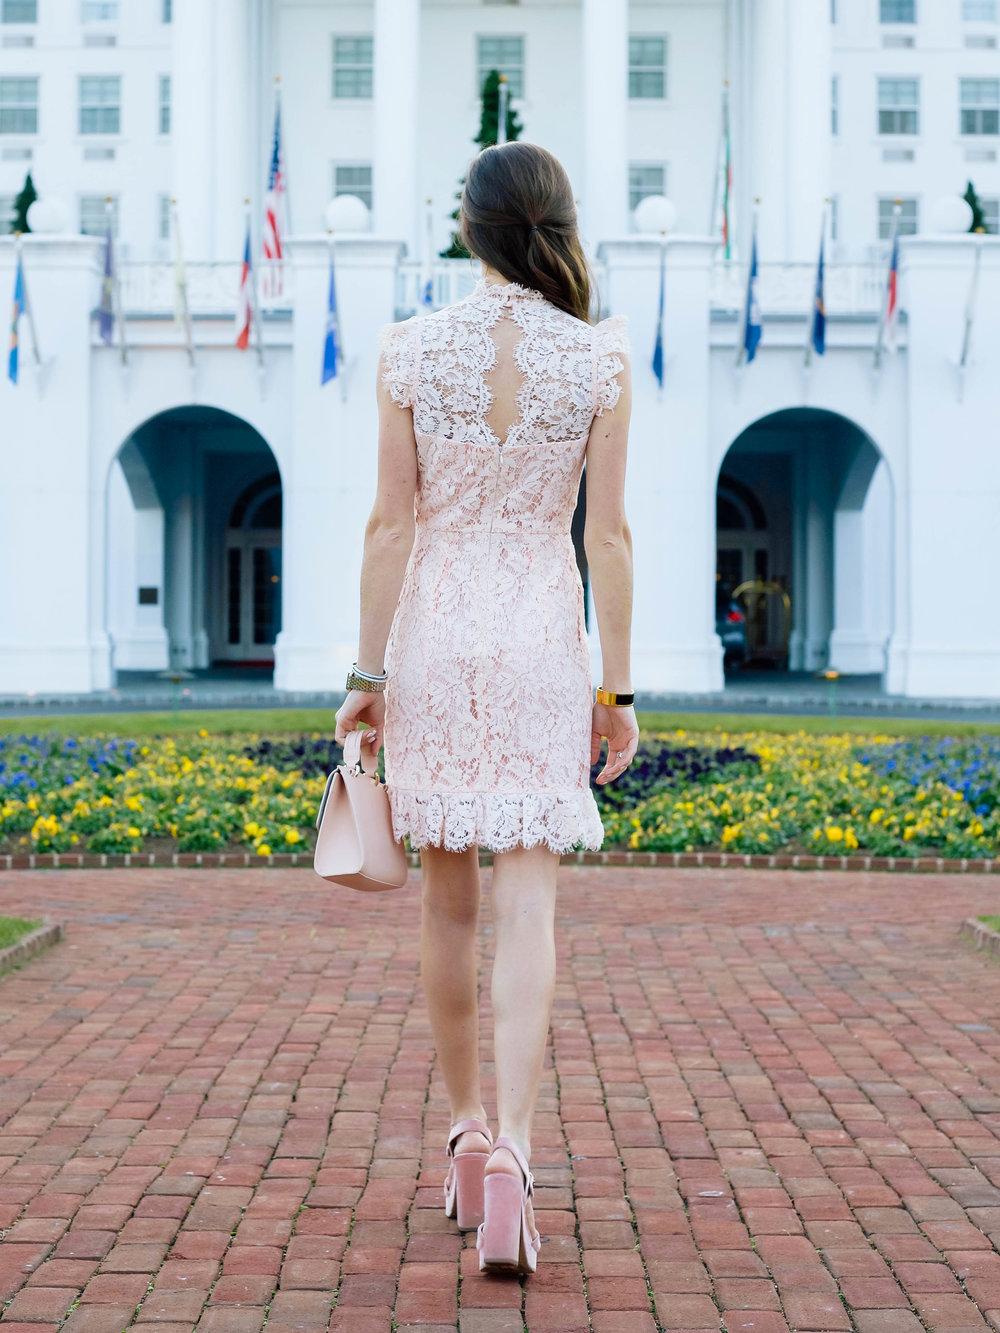 fashion blogger lcb style greenbrier resort (10 of 22).jpg